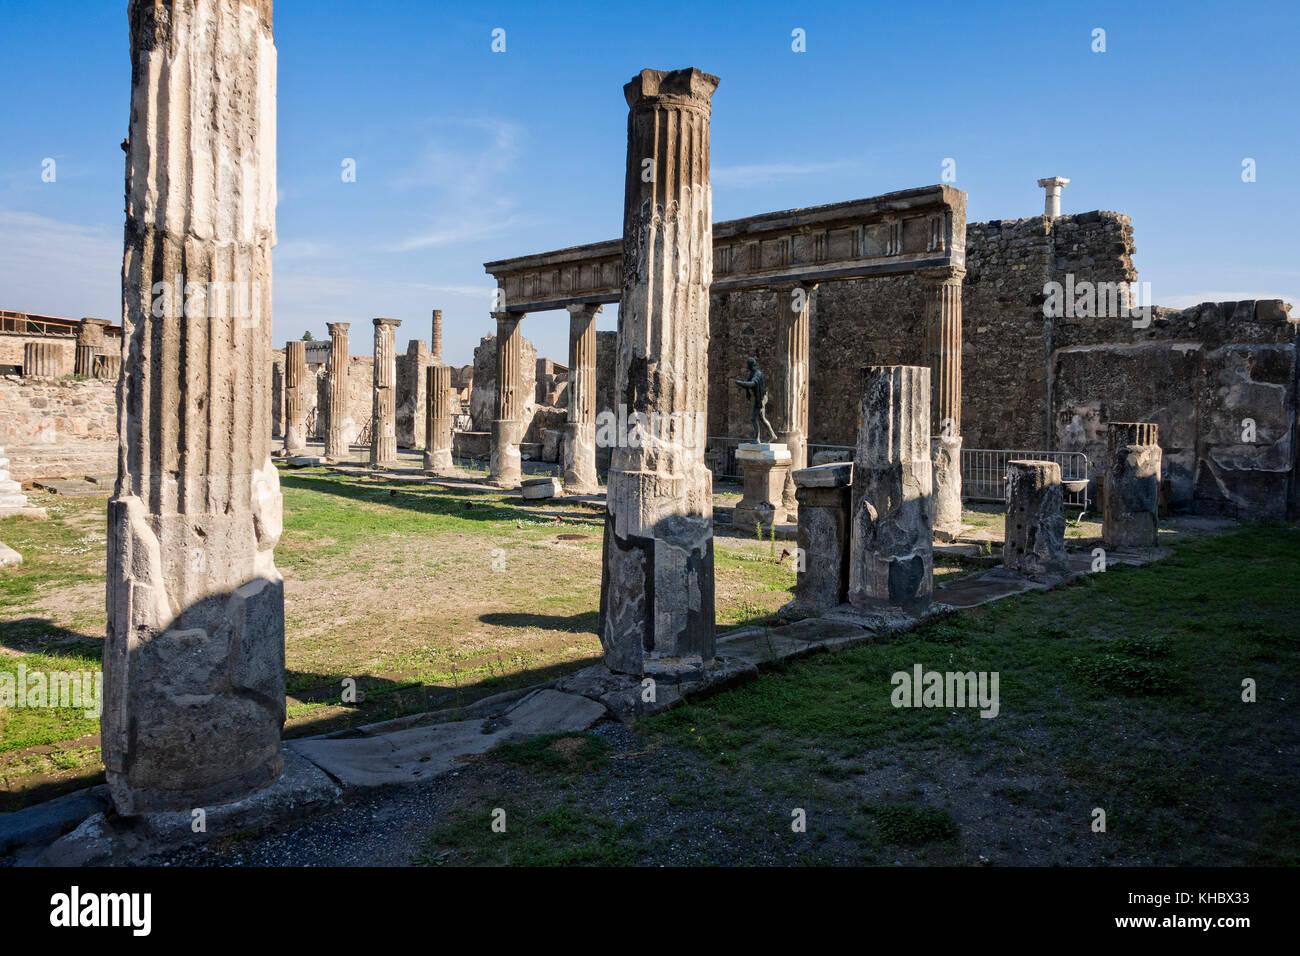 The Temple of Apolloat Pompeii near Naples and Mt. Vesuvius, Campania, Italy. - Stock Image